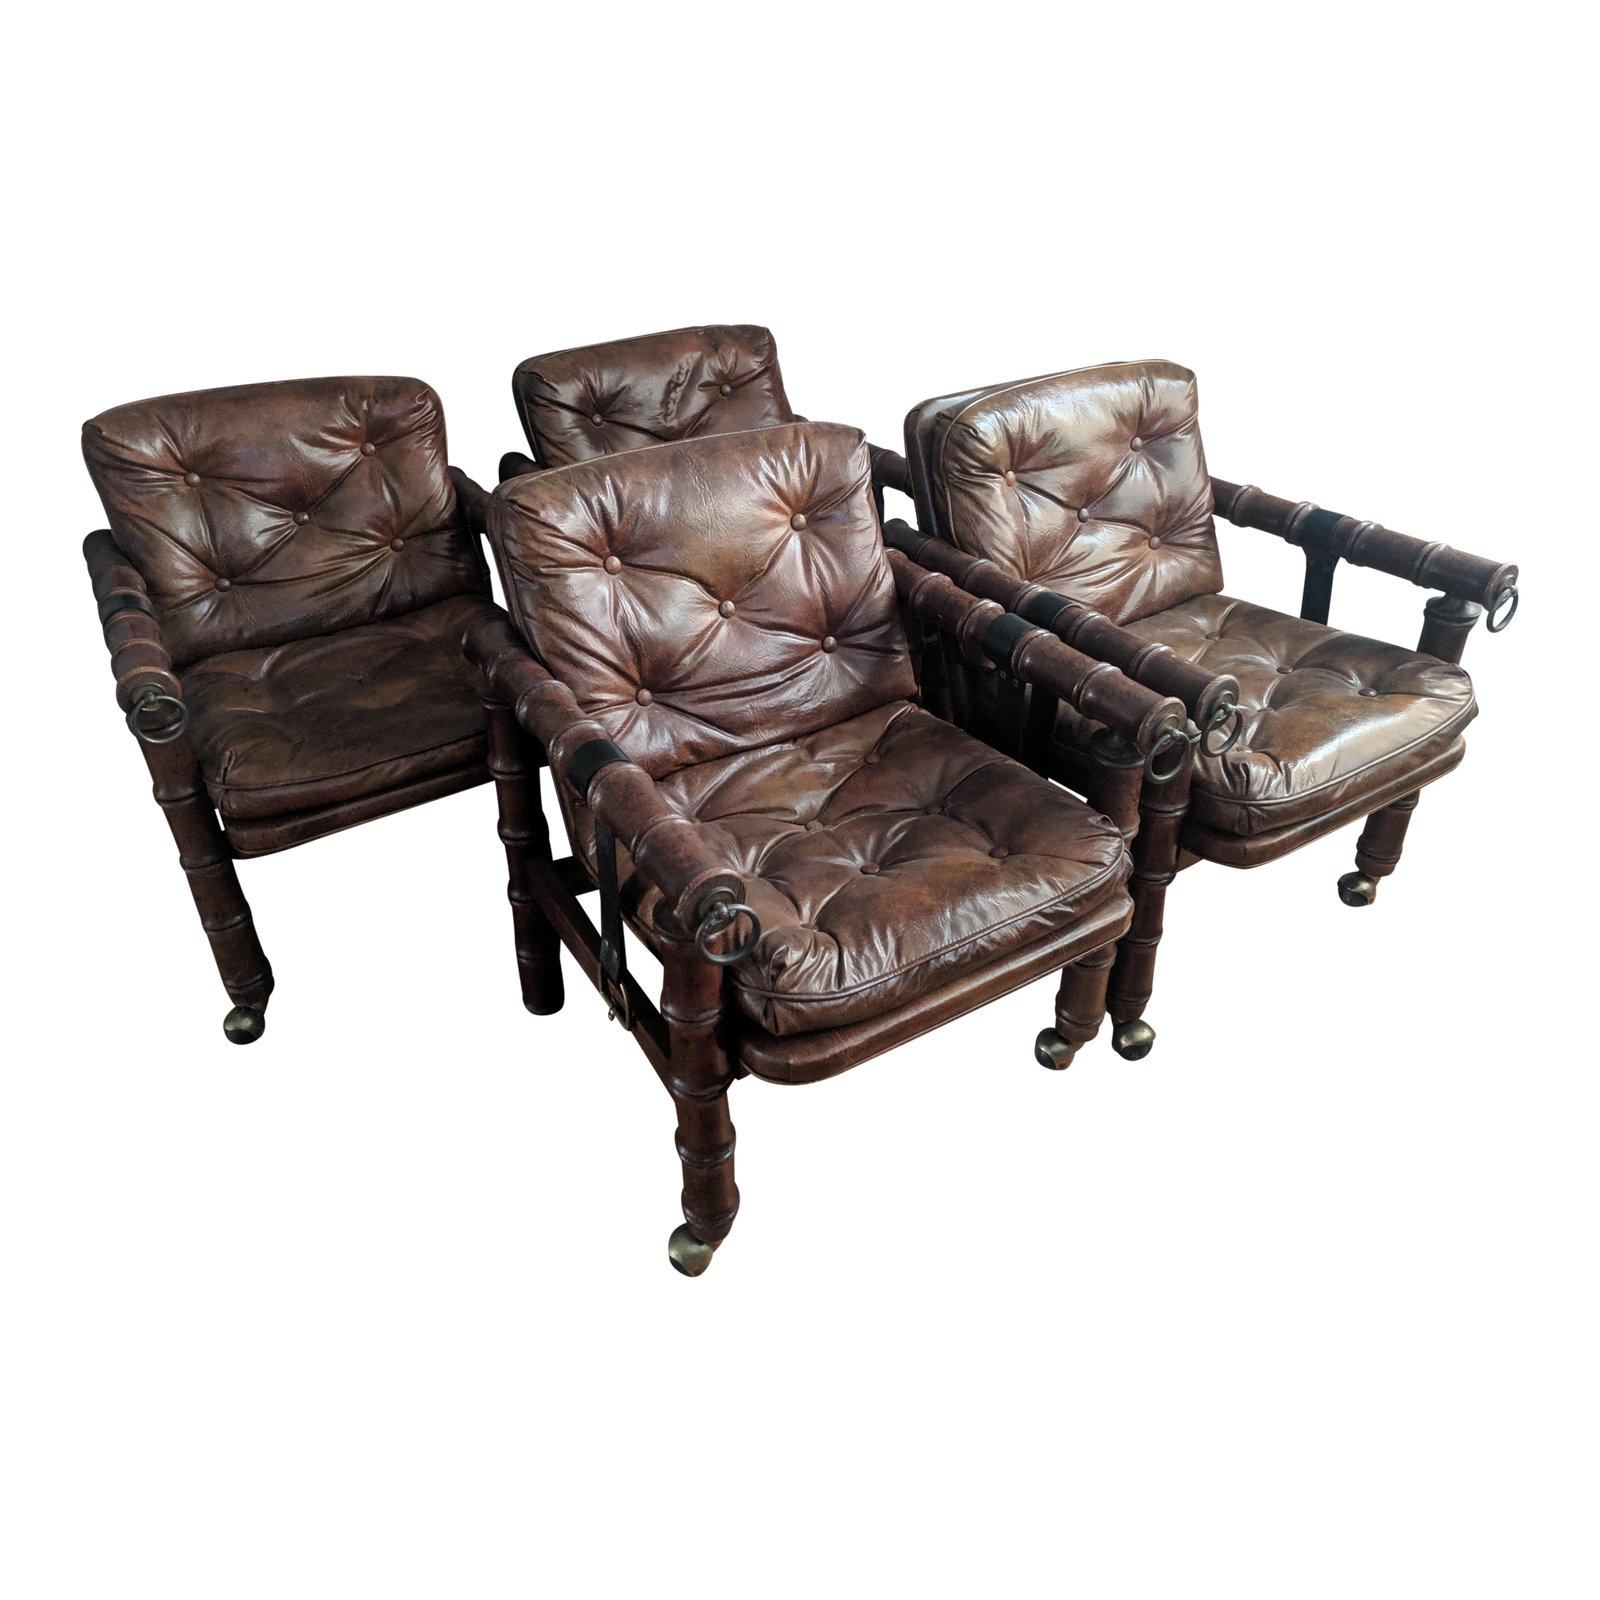 bamboo-inspired-tufted-vinyl-chairs-set-of-4-7982.jpg